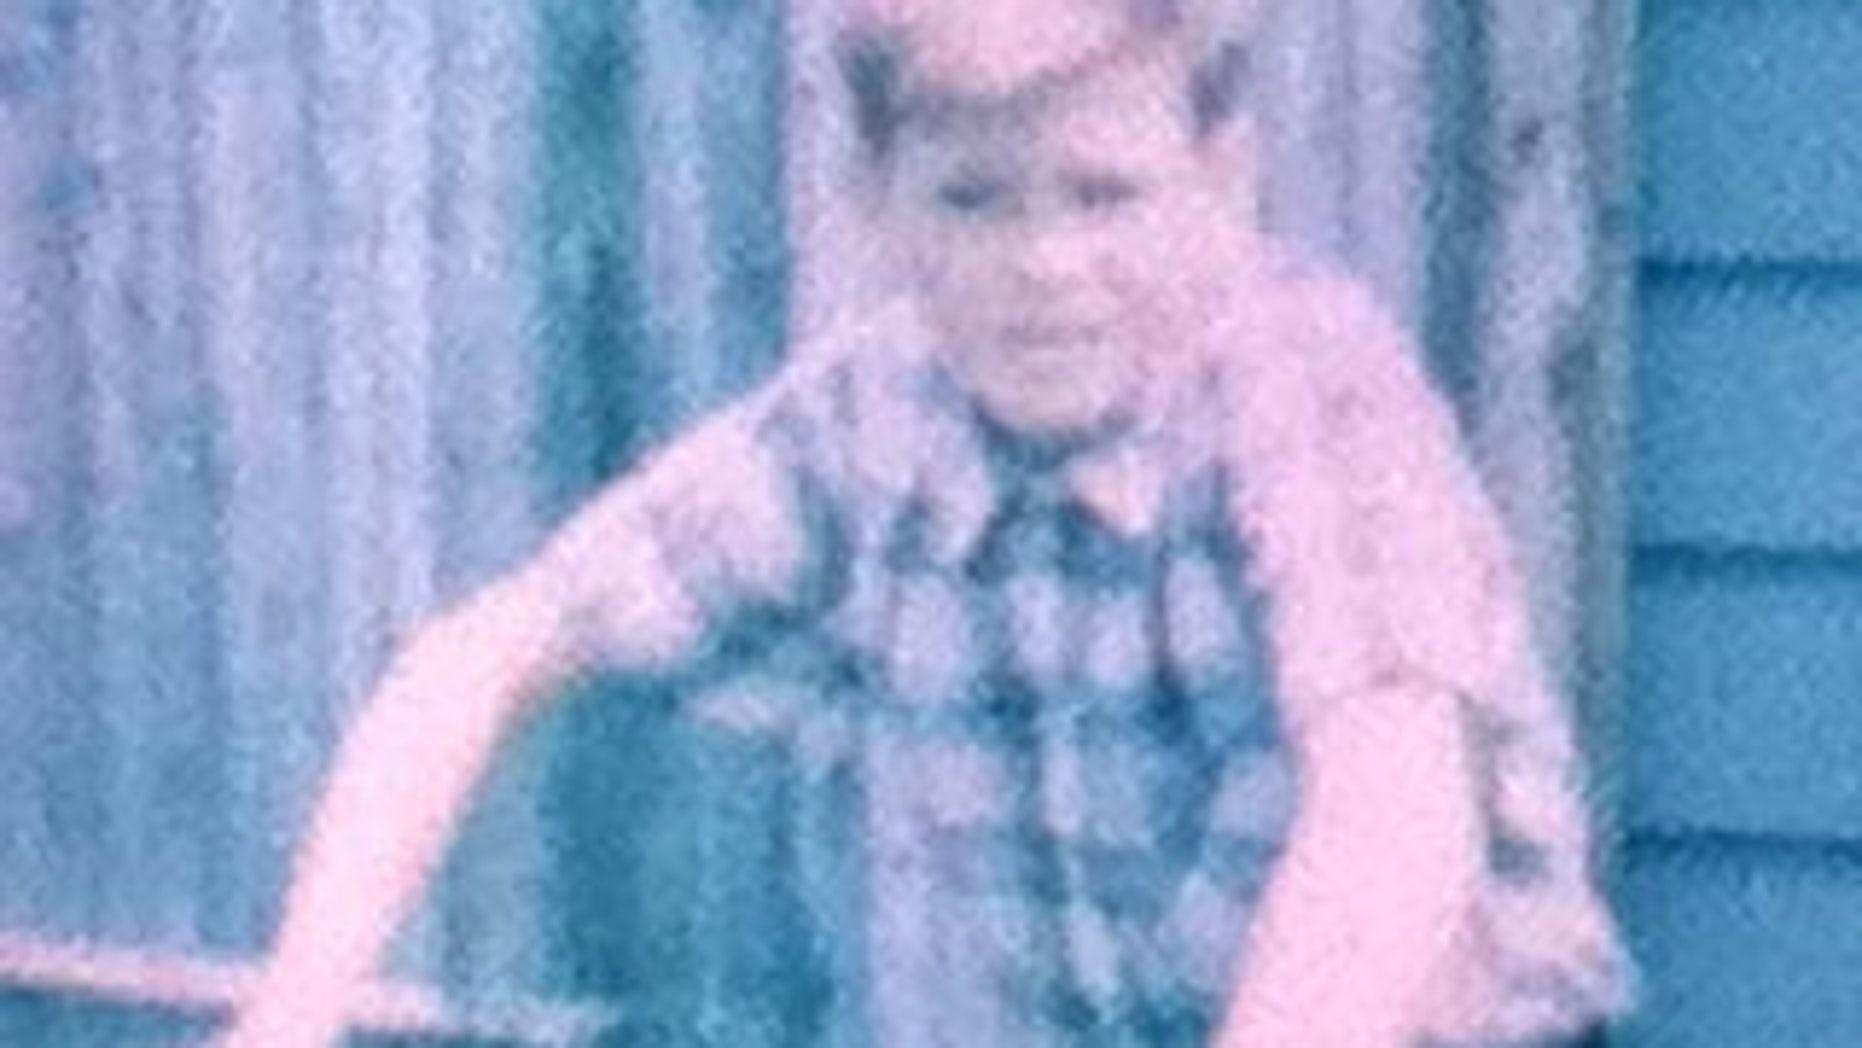 John Joseph McCabe in 1969